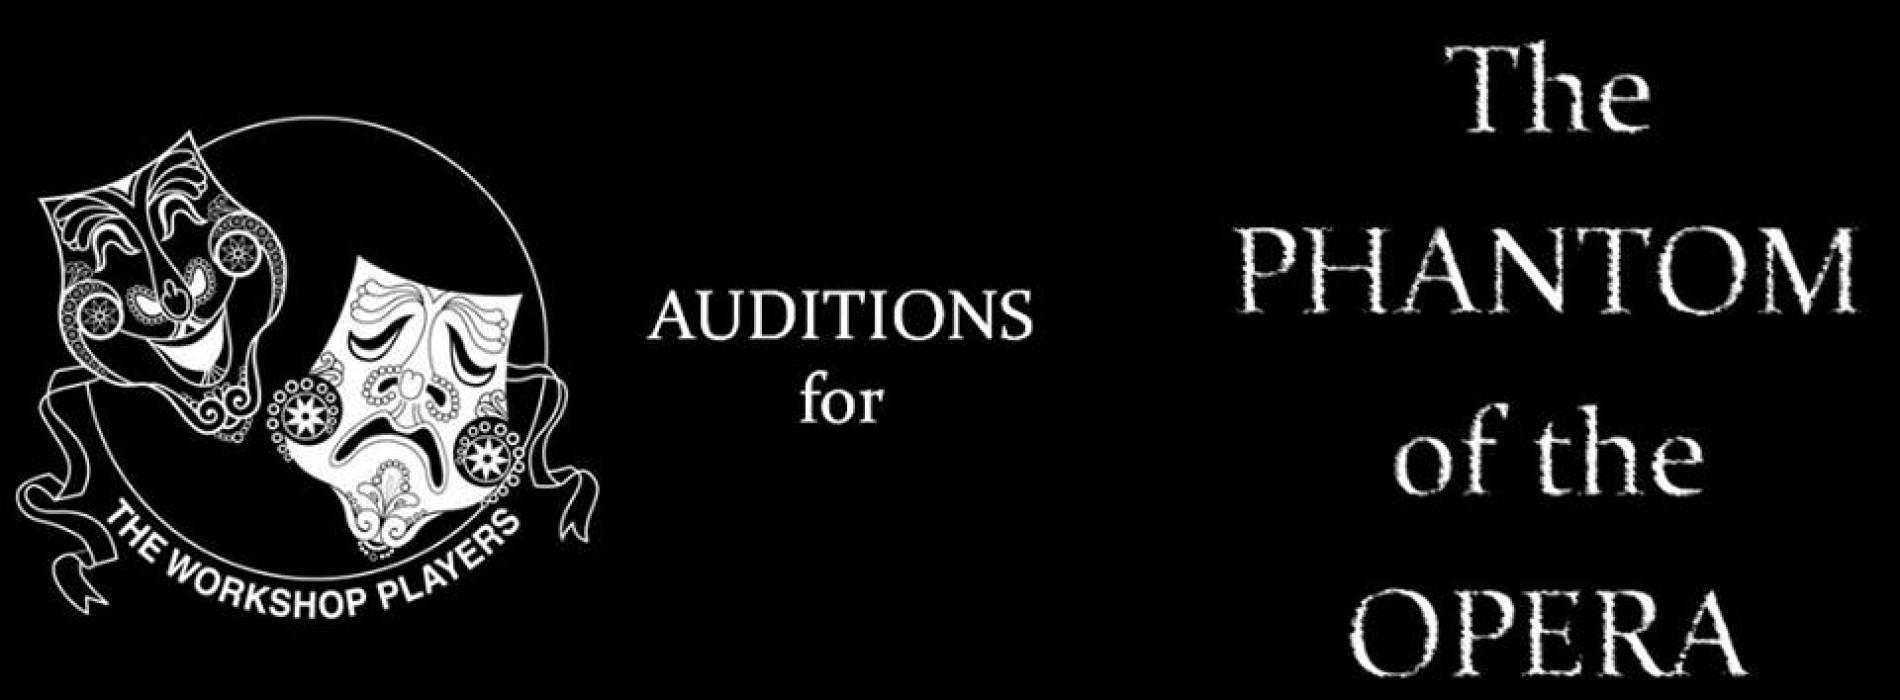 Phantom of the Opera: Auditions